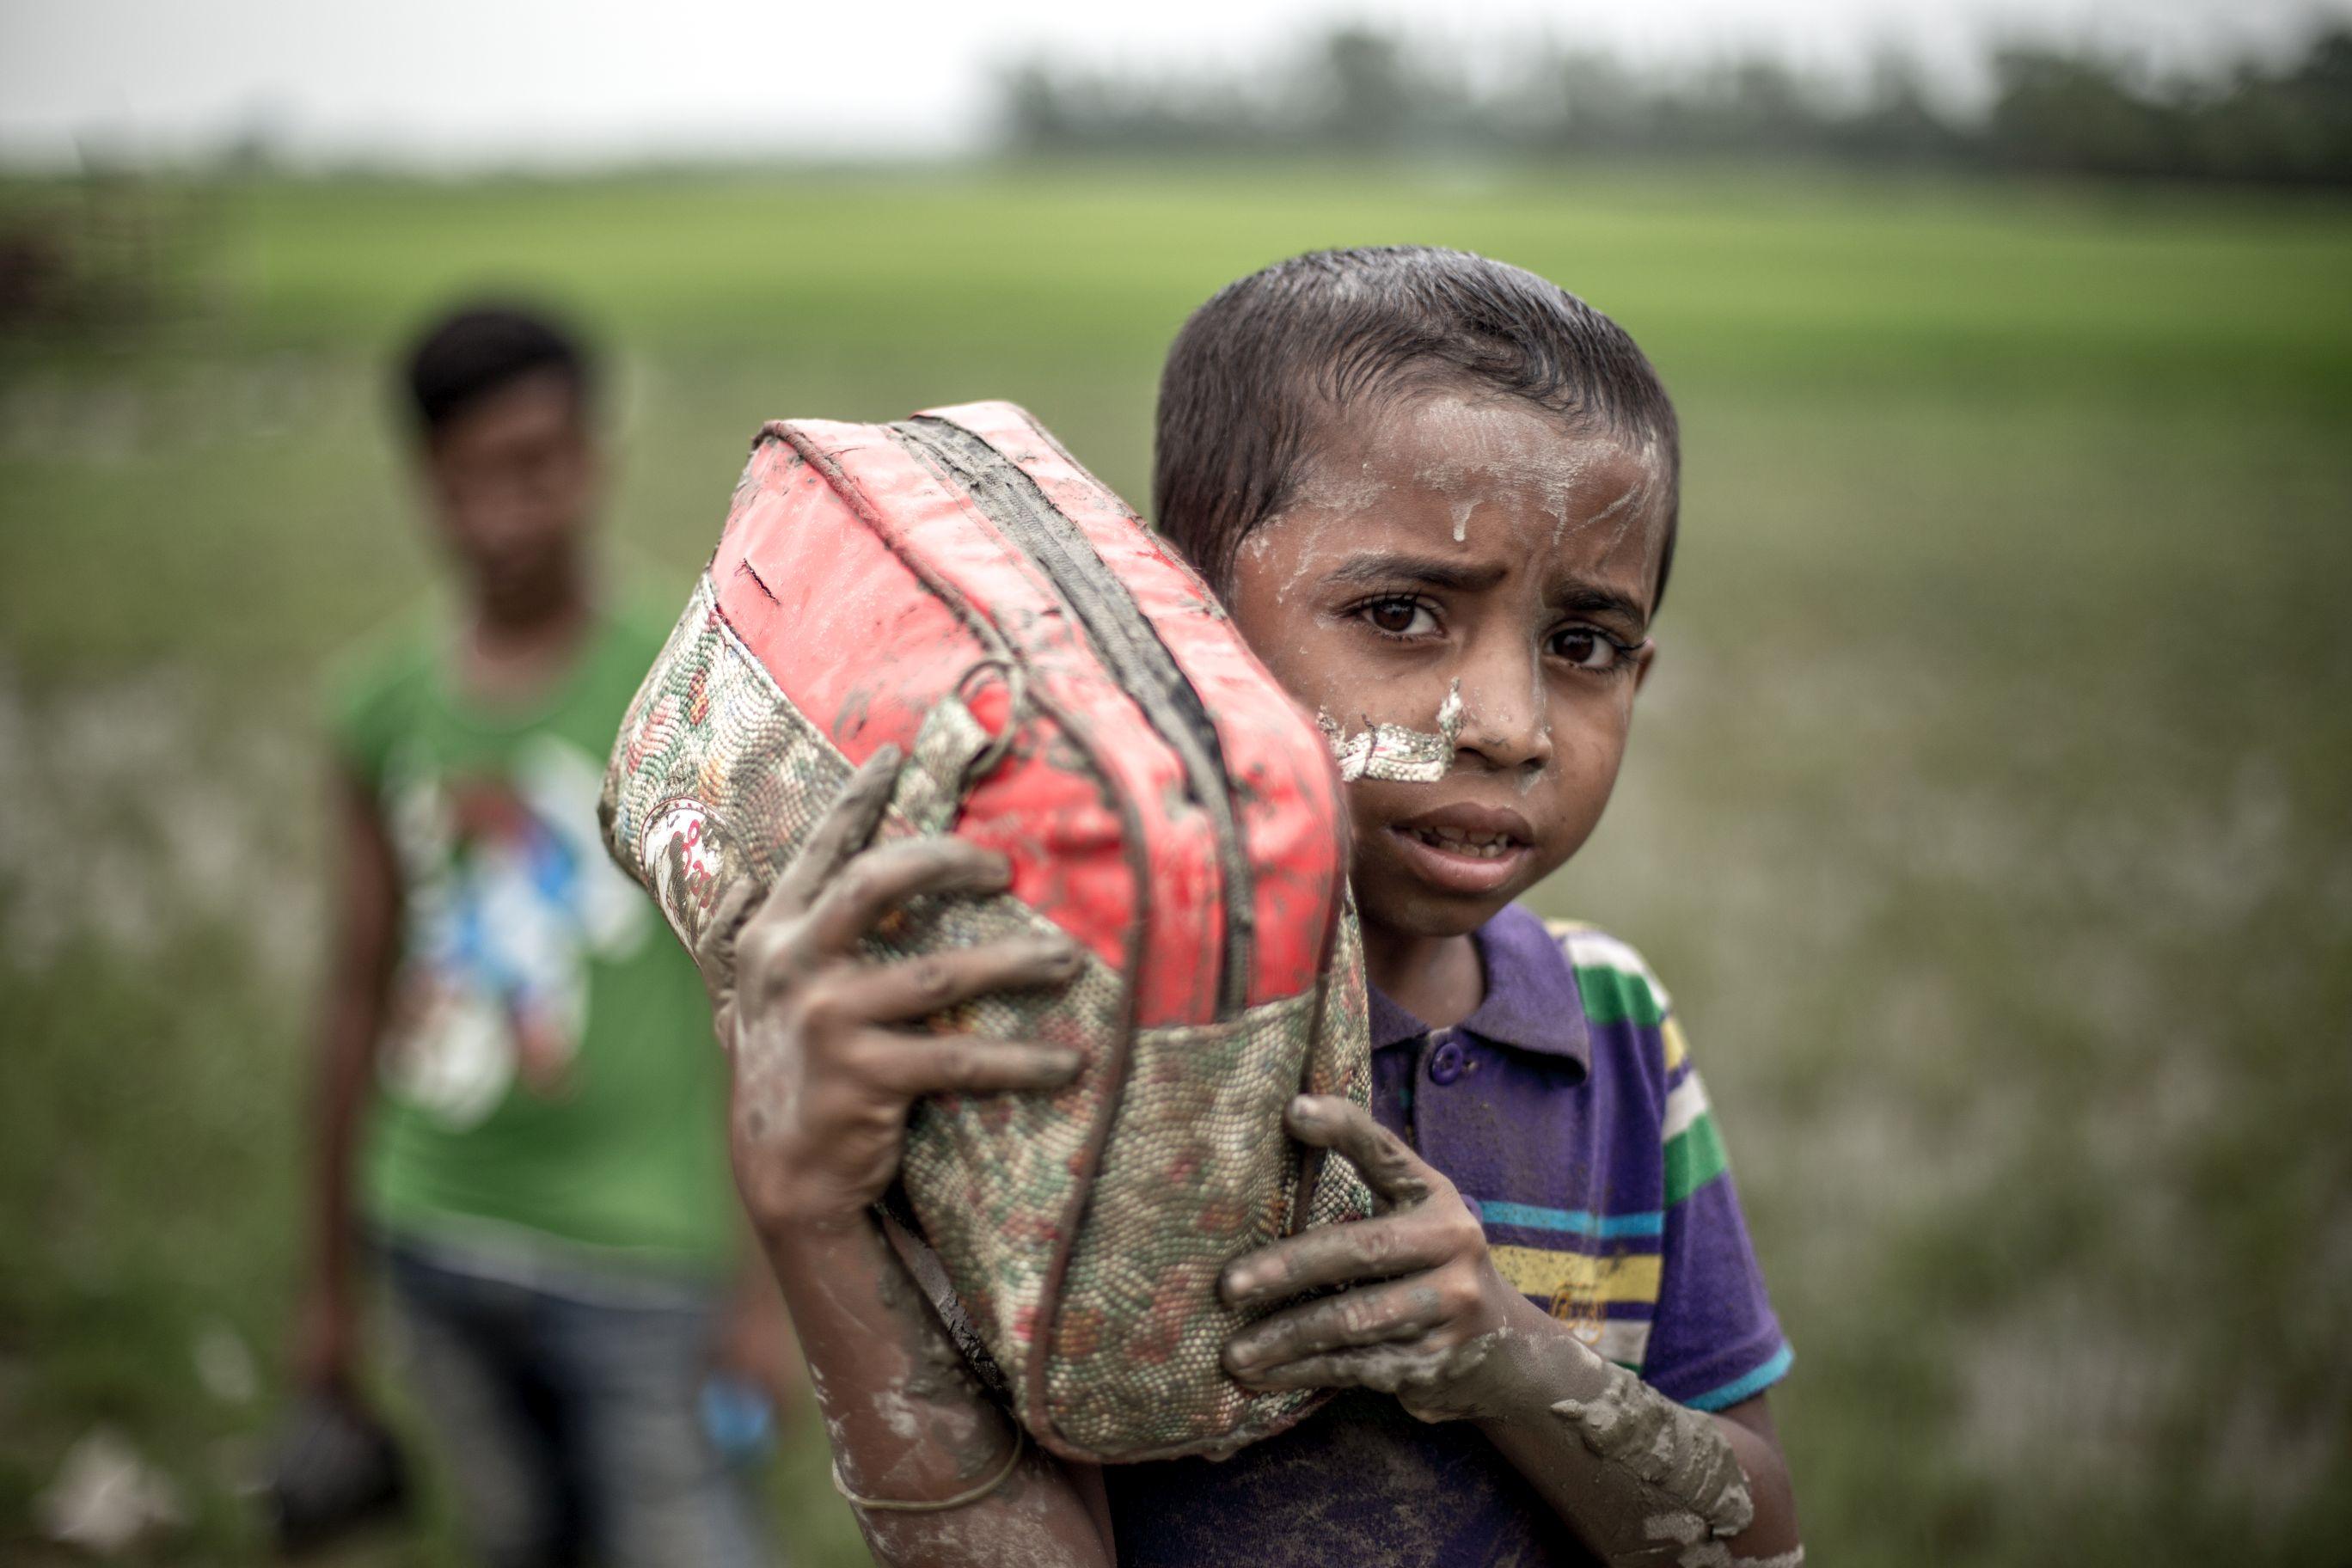 Care Australia, Rohingya, Myanmar, Burma, Bangladesh, refugee crisis